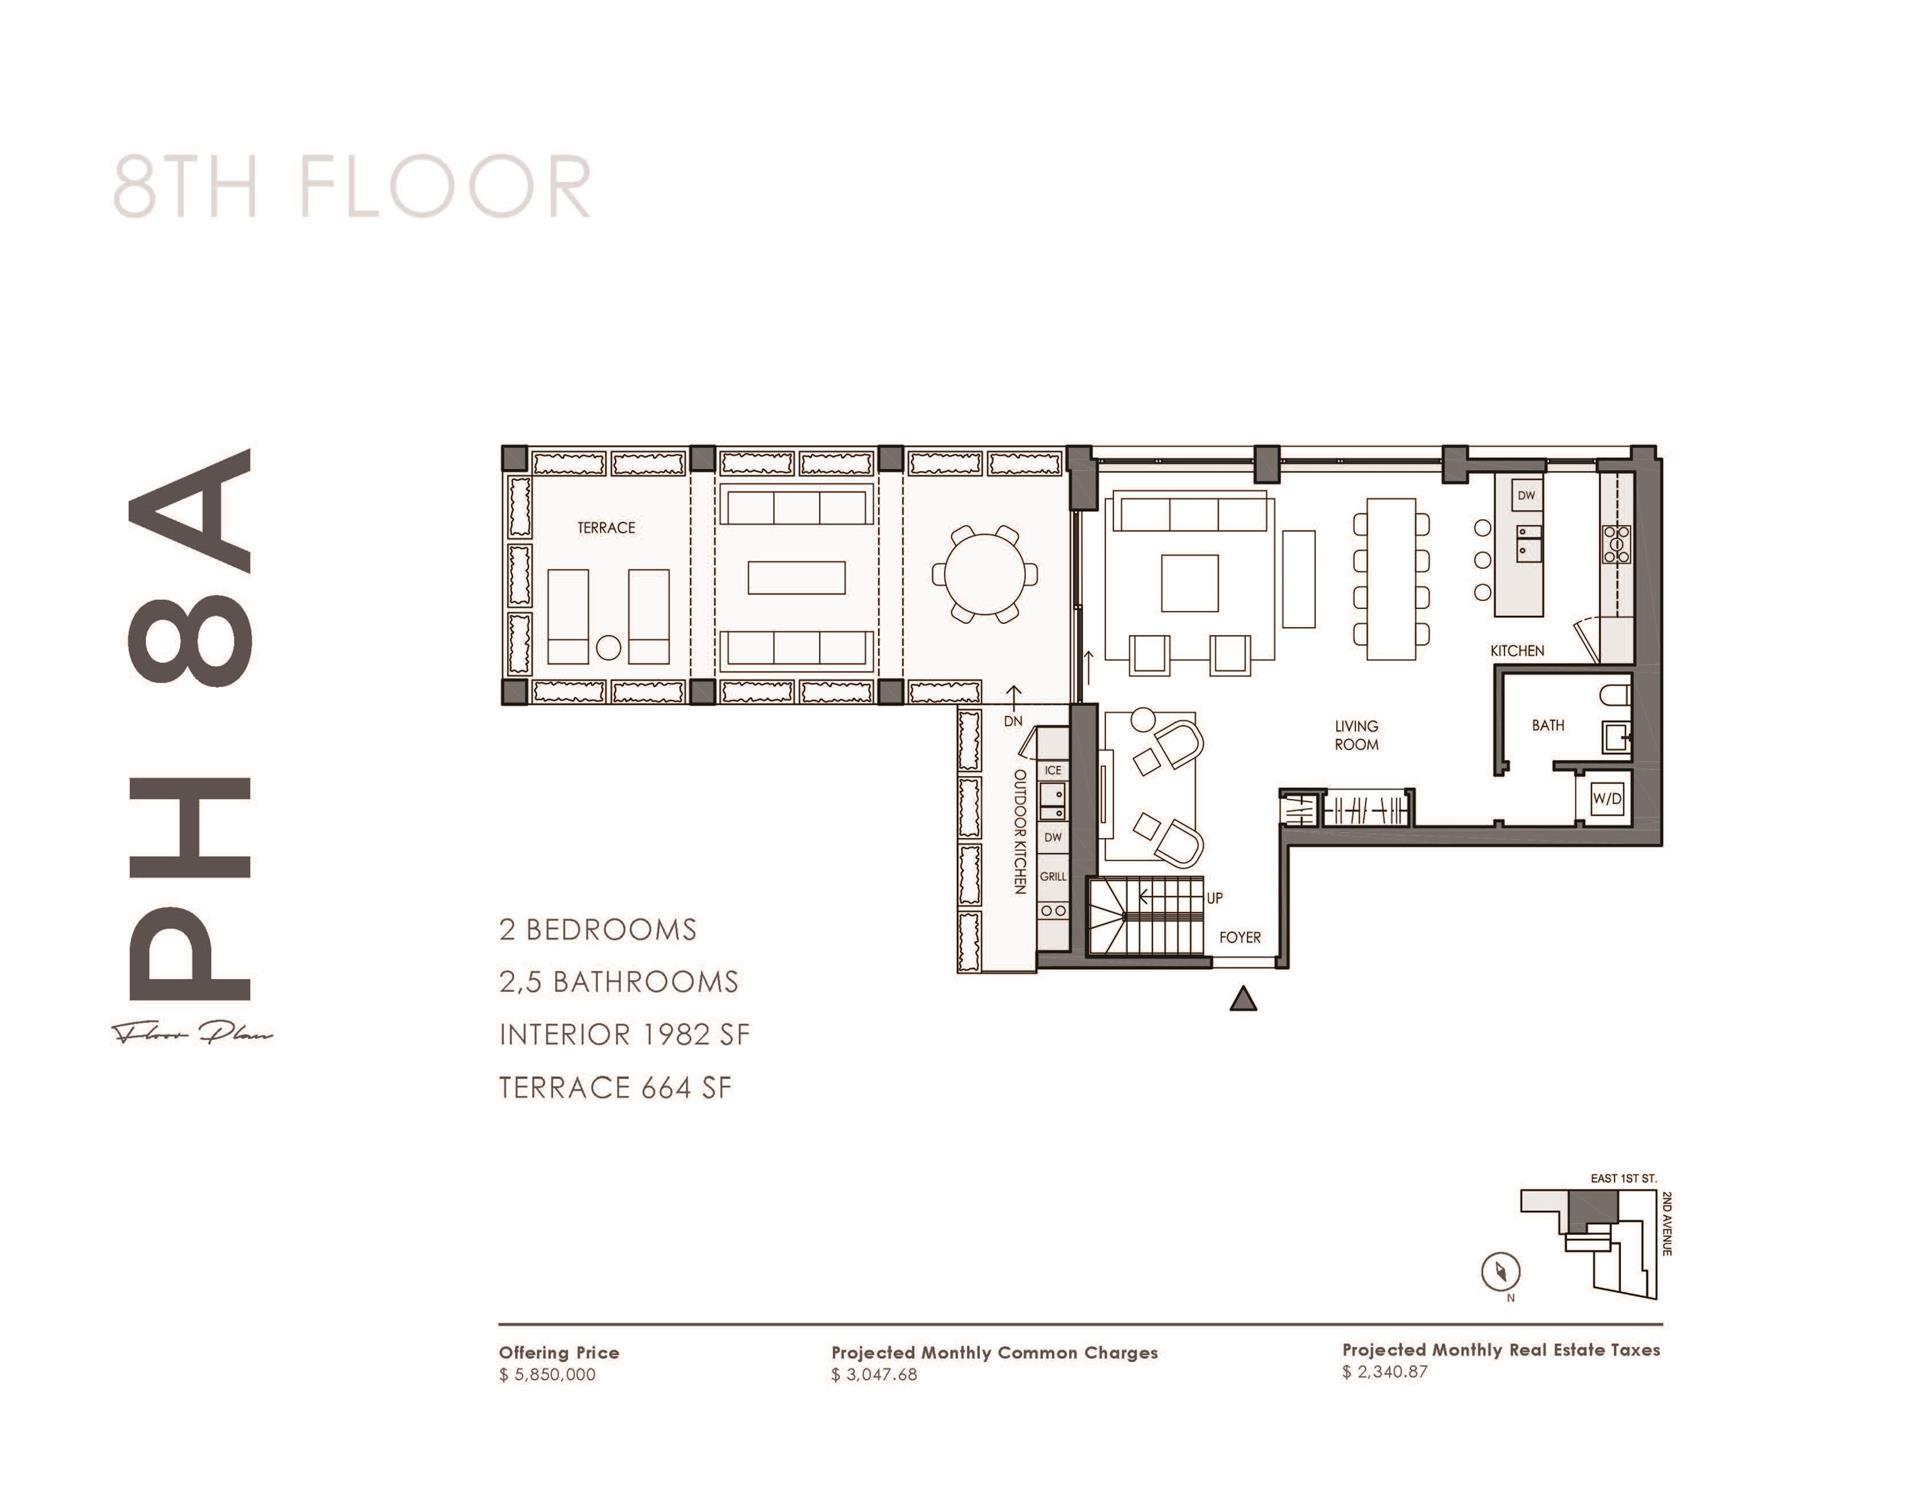 Floor plan of 32 East 1st St, PH8A - East Village, New York